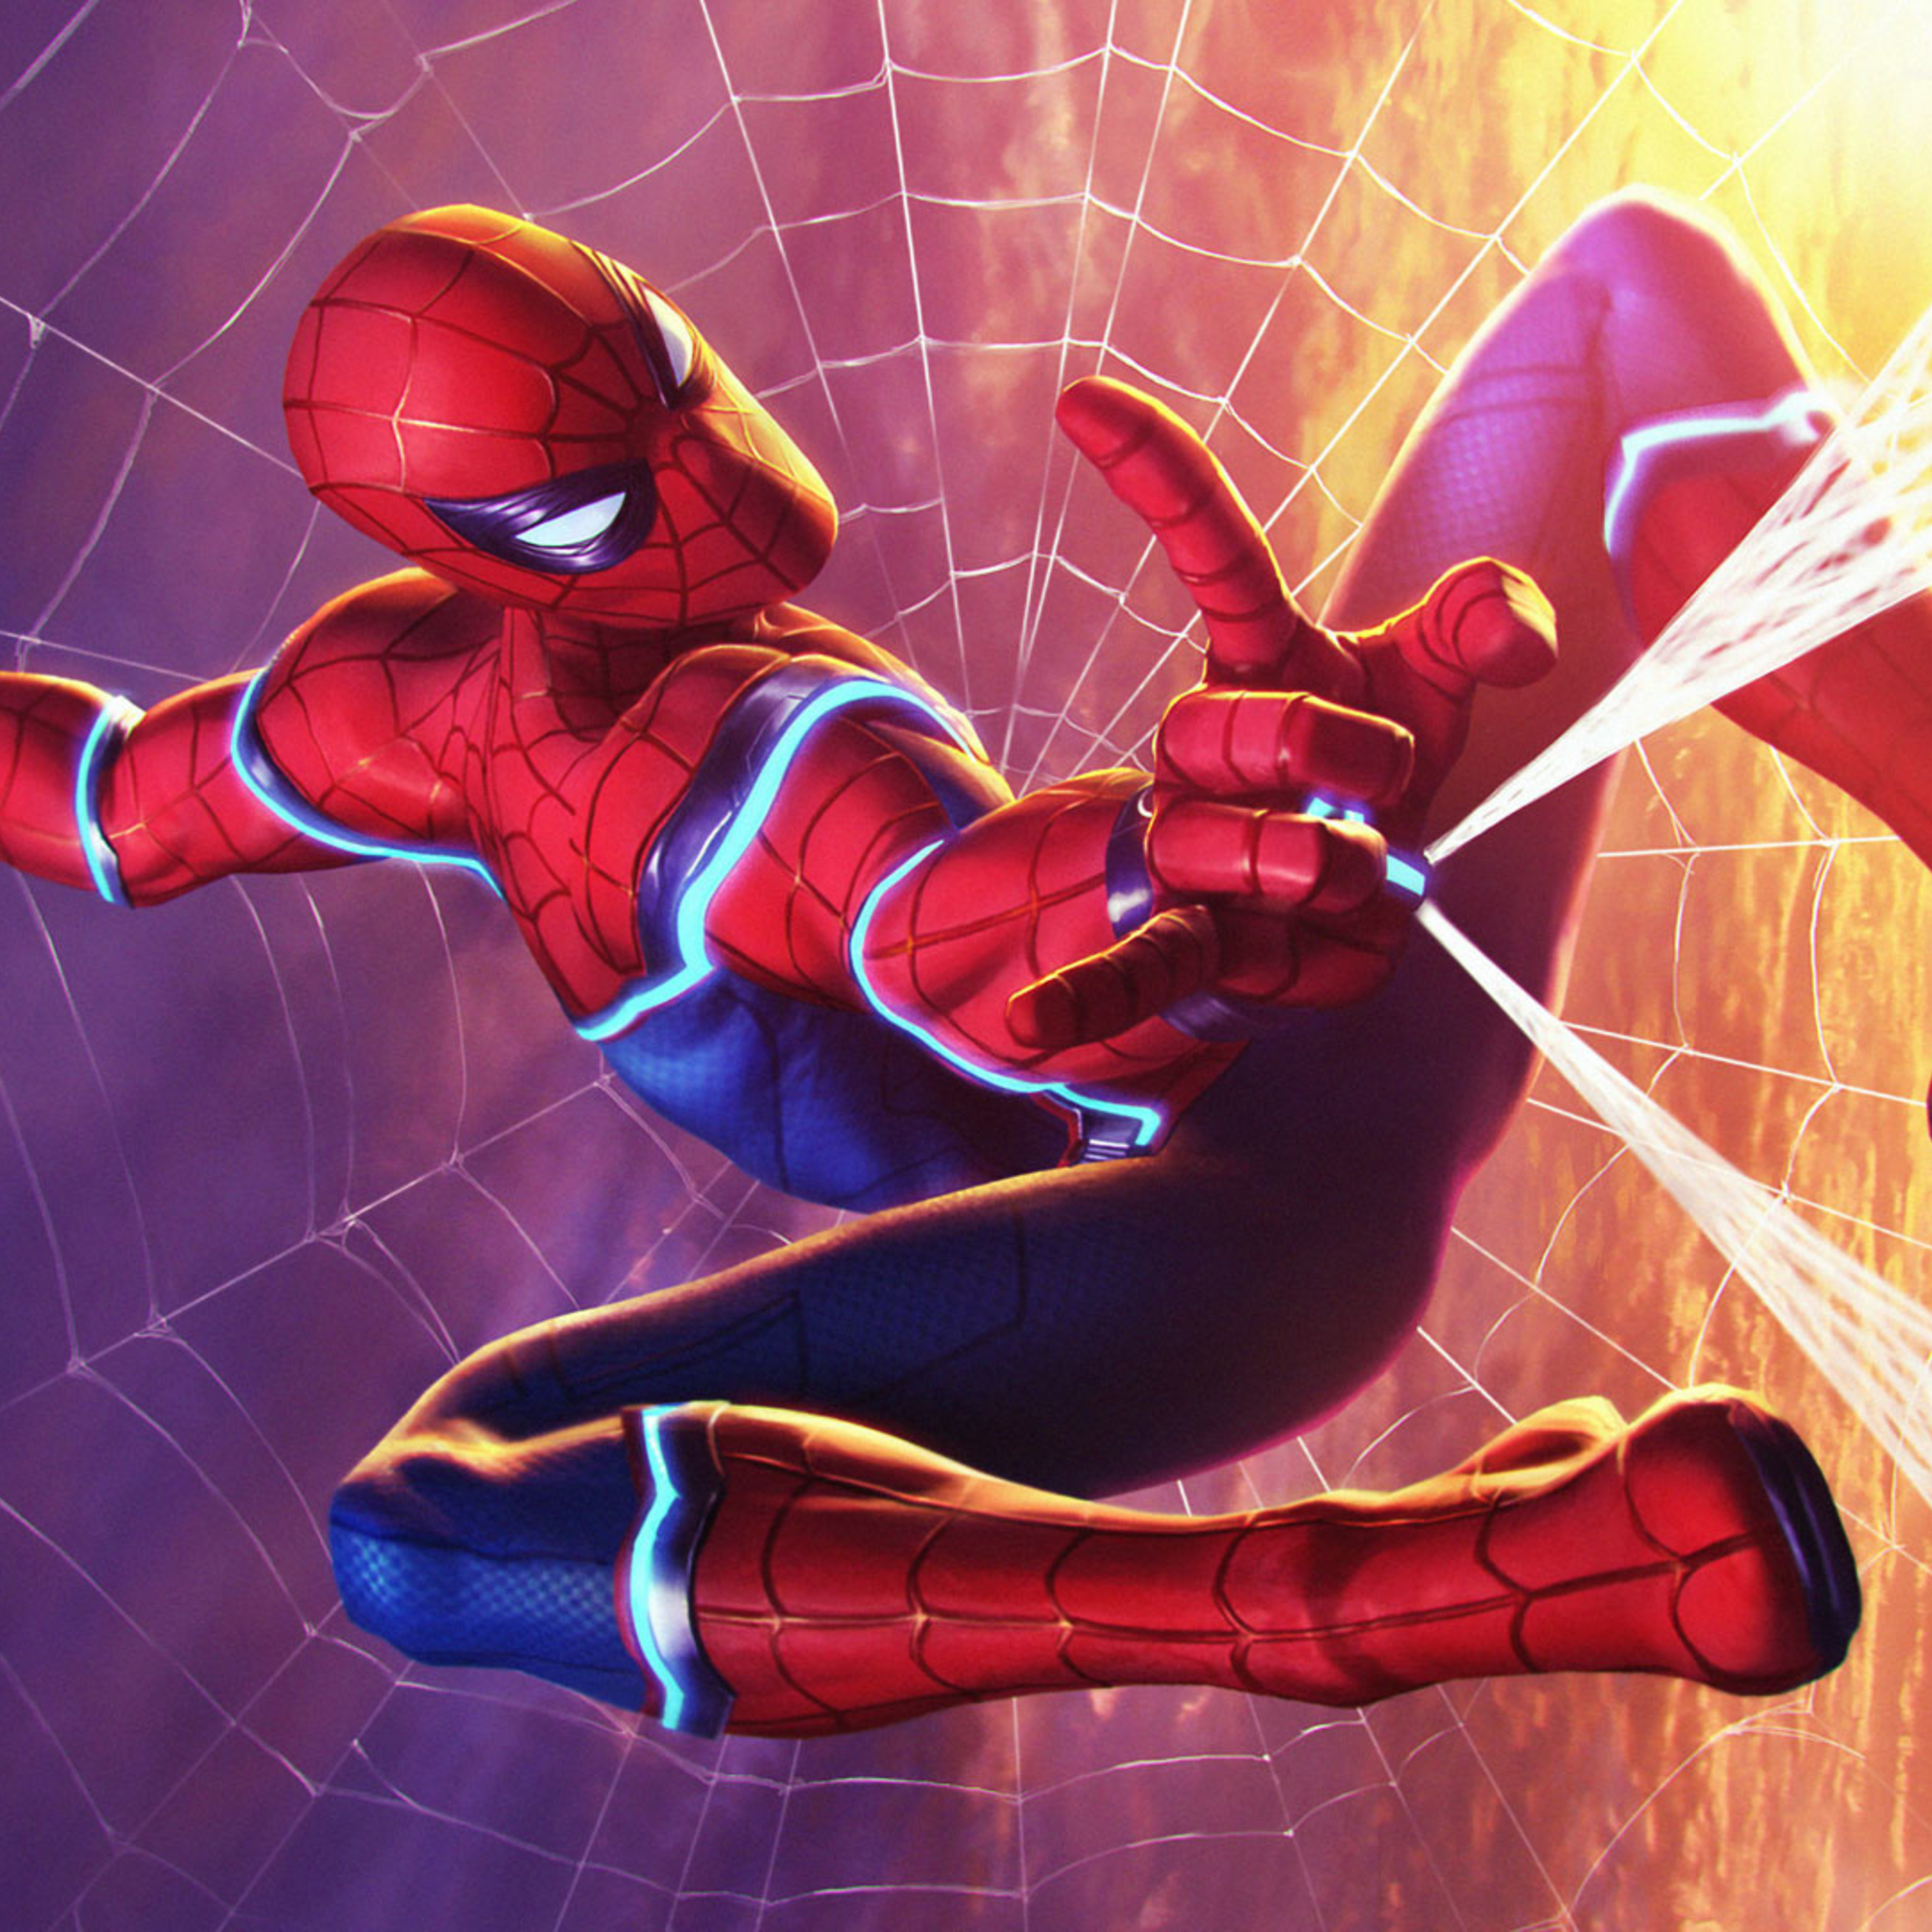 2932x2932 Spiderman Marvel Contest Of Champions Ipad Pro